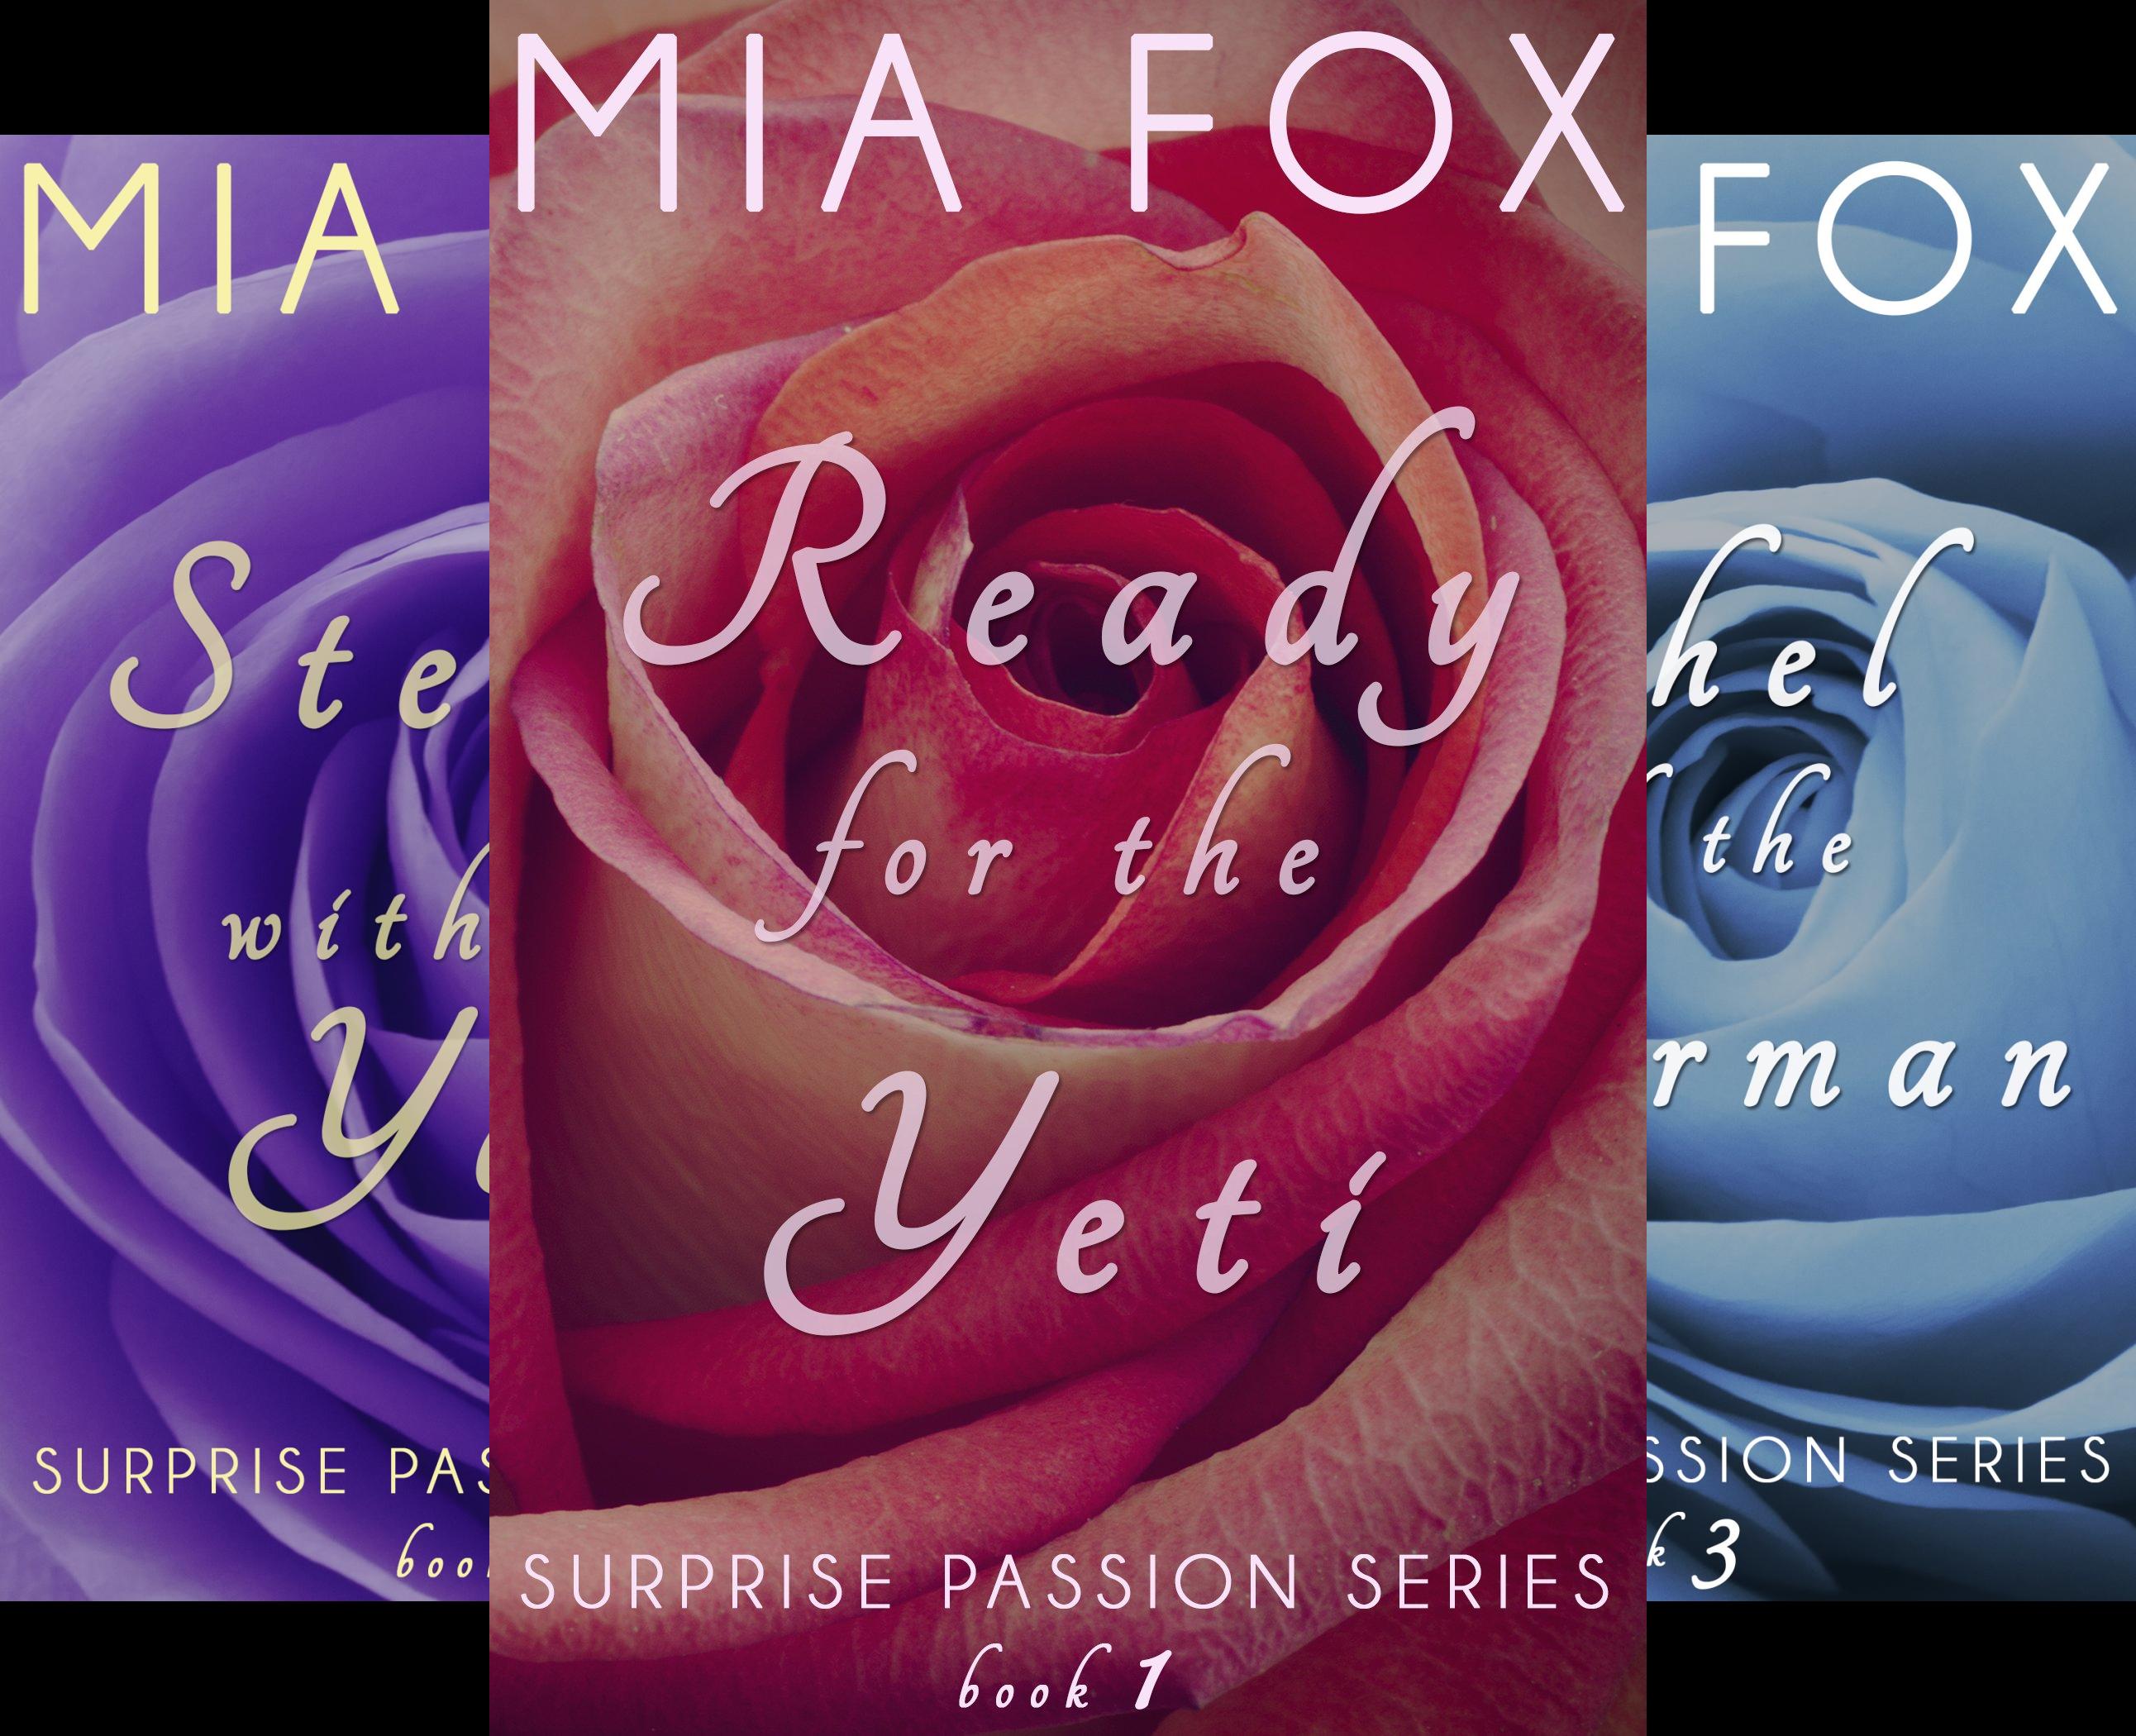 Surprise Passion Series (5 Book Series)